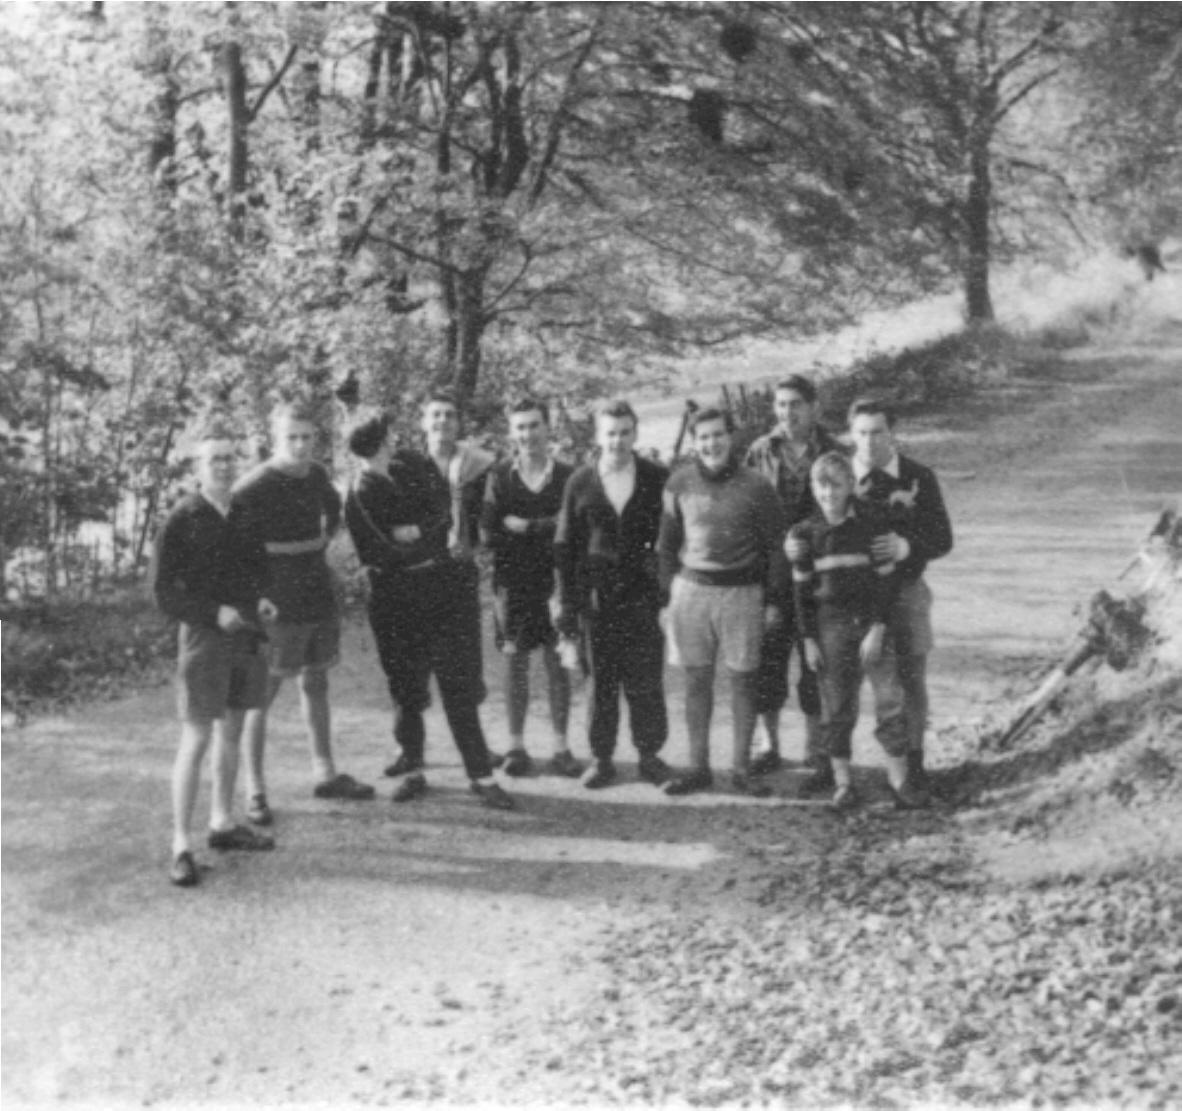 The Northwood Wheelers near Princes Risborough